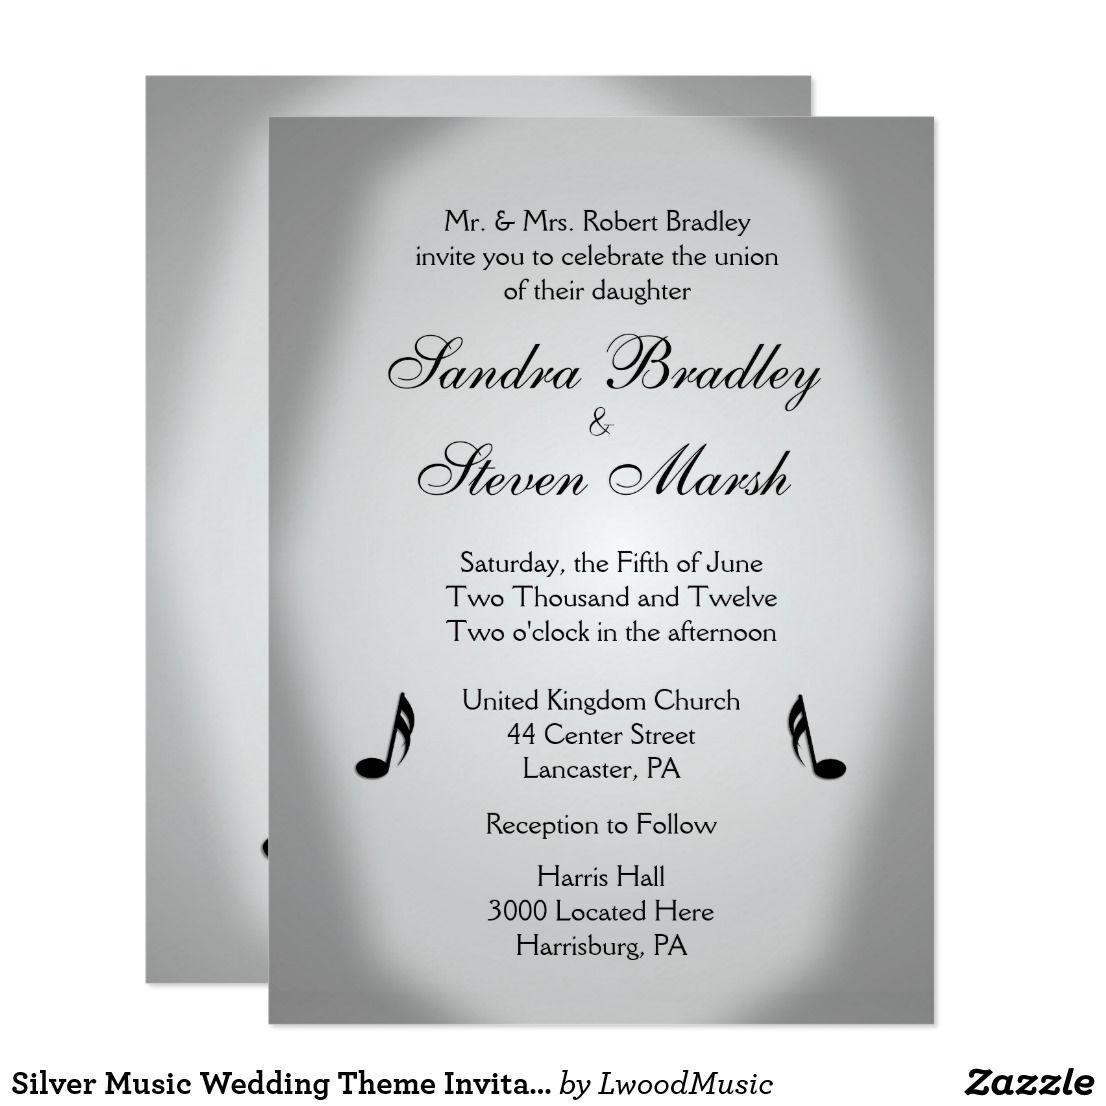 Silver Music Wedding Theme Invitation | Music wedding themes and ...